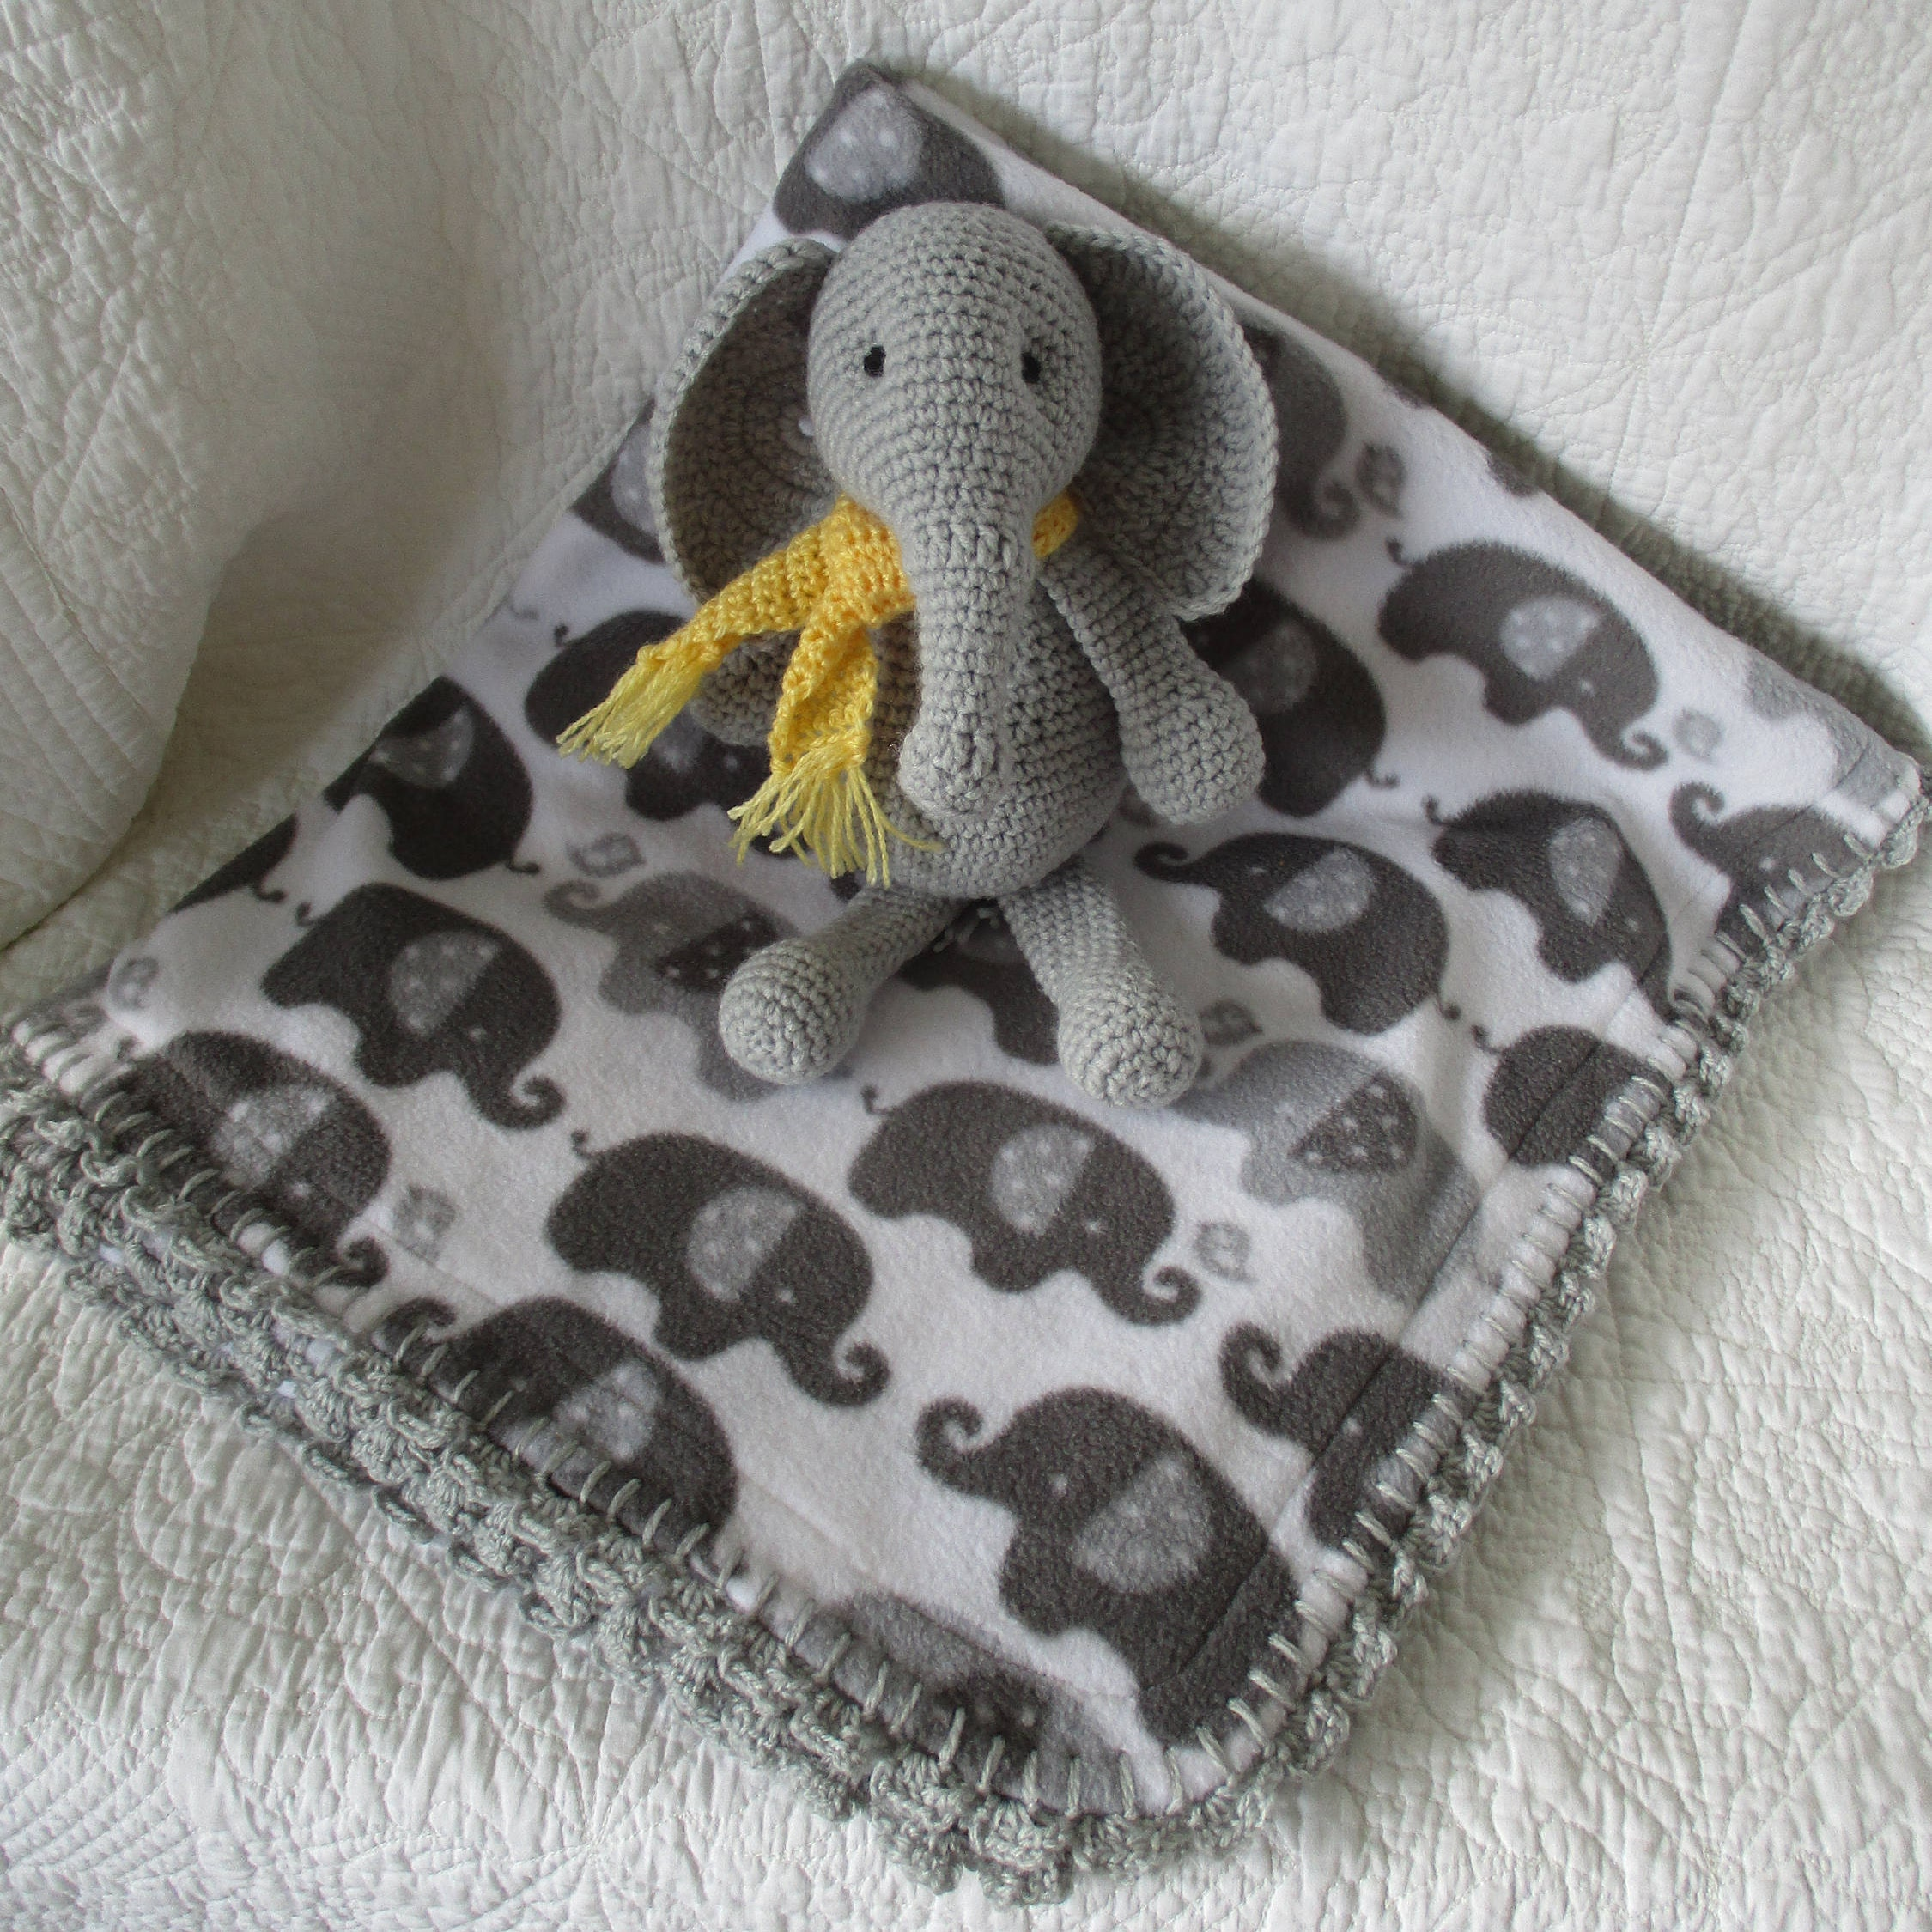 Old Fashioned Crochet Elephant Blanket Pattern Sketch - Sewing ...